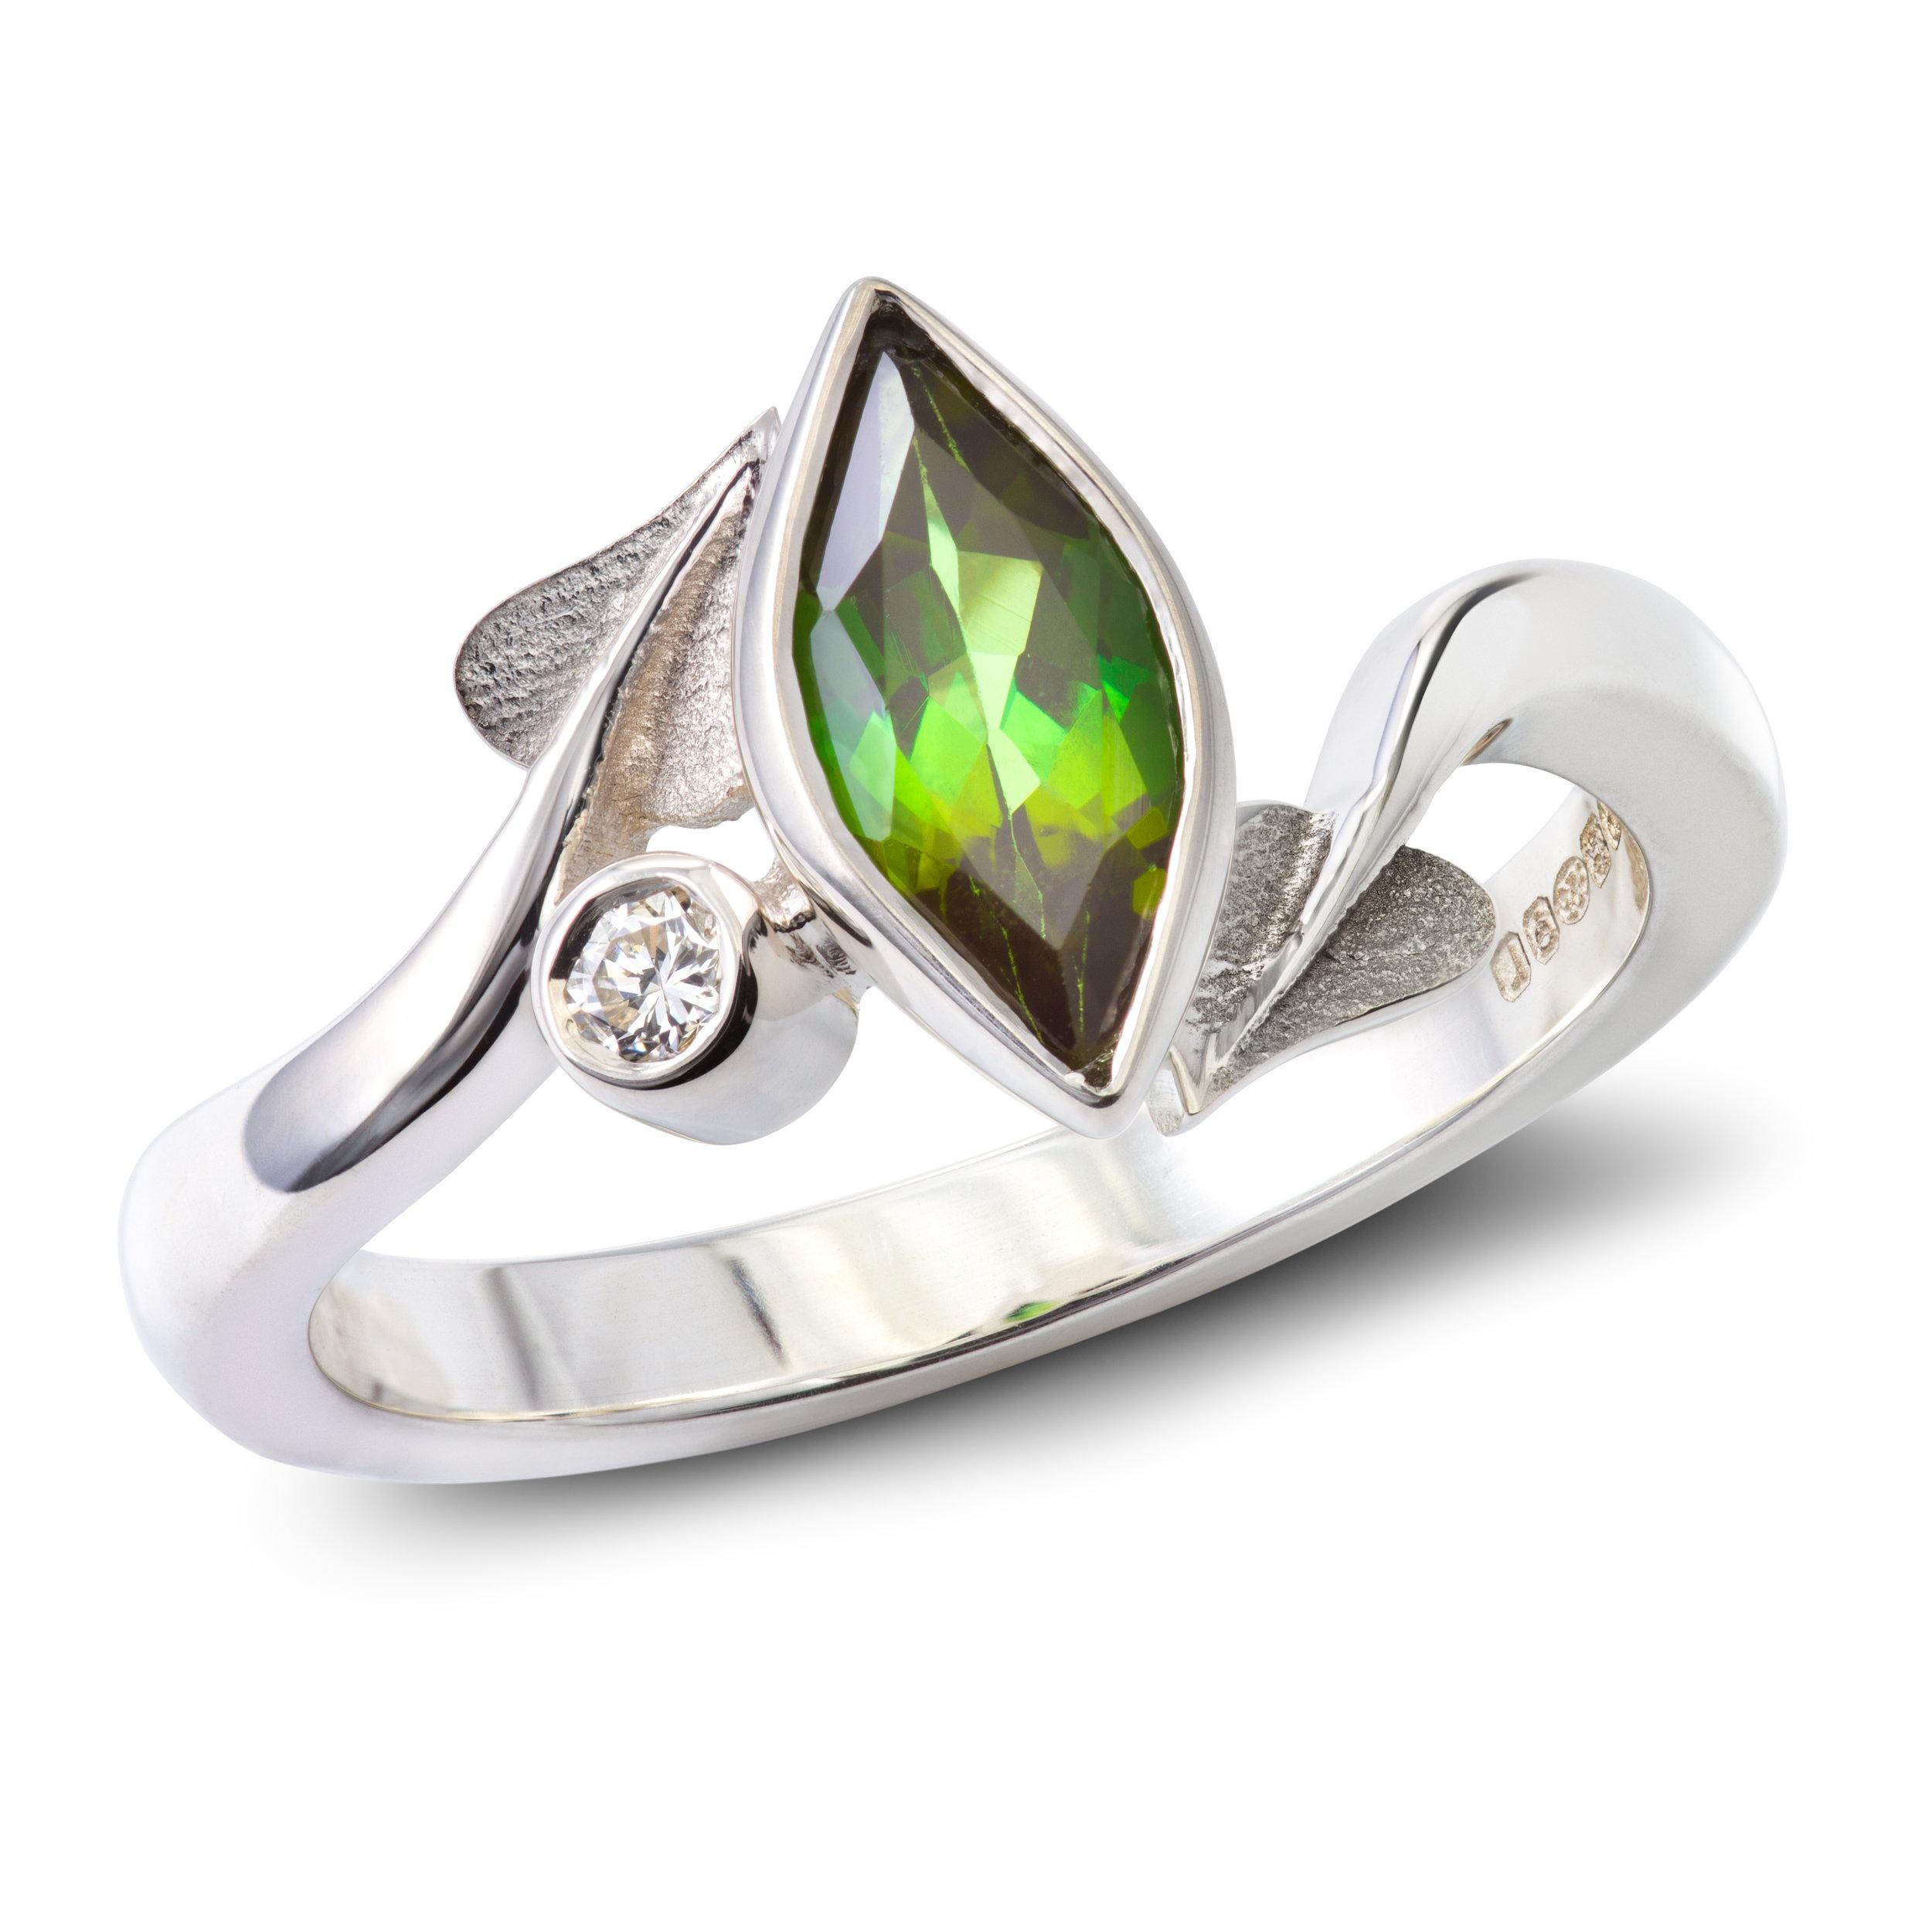 Bespoke silver,tourmaline and diamond engagement ring commission